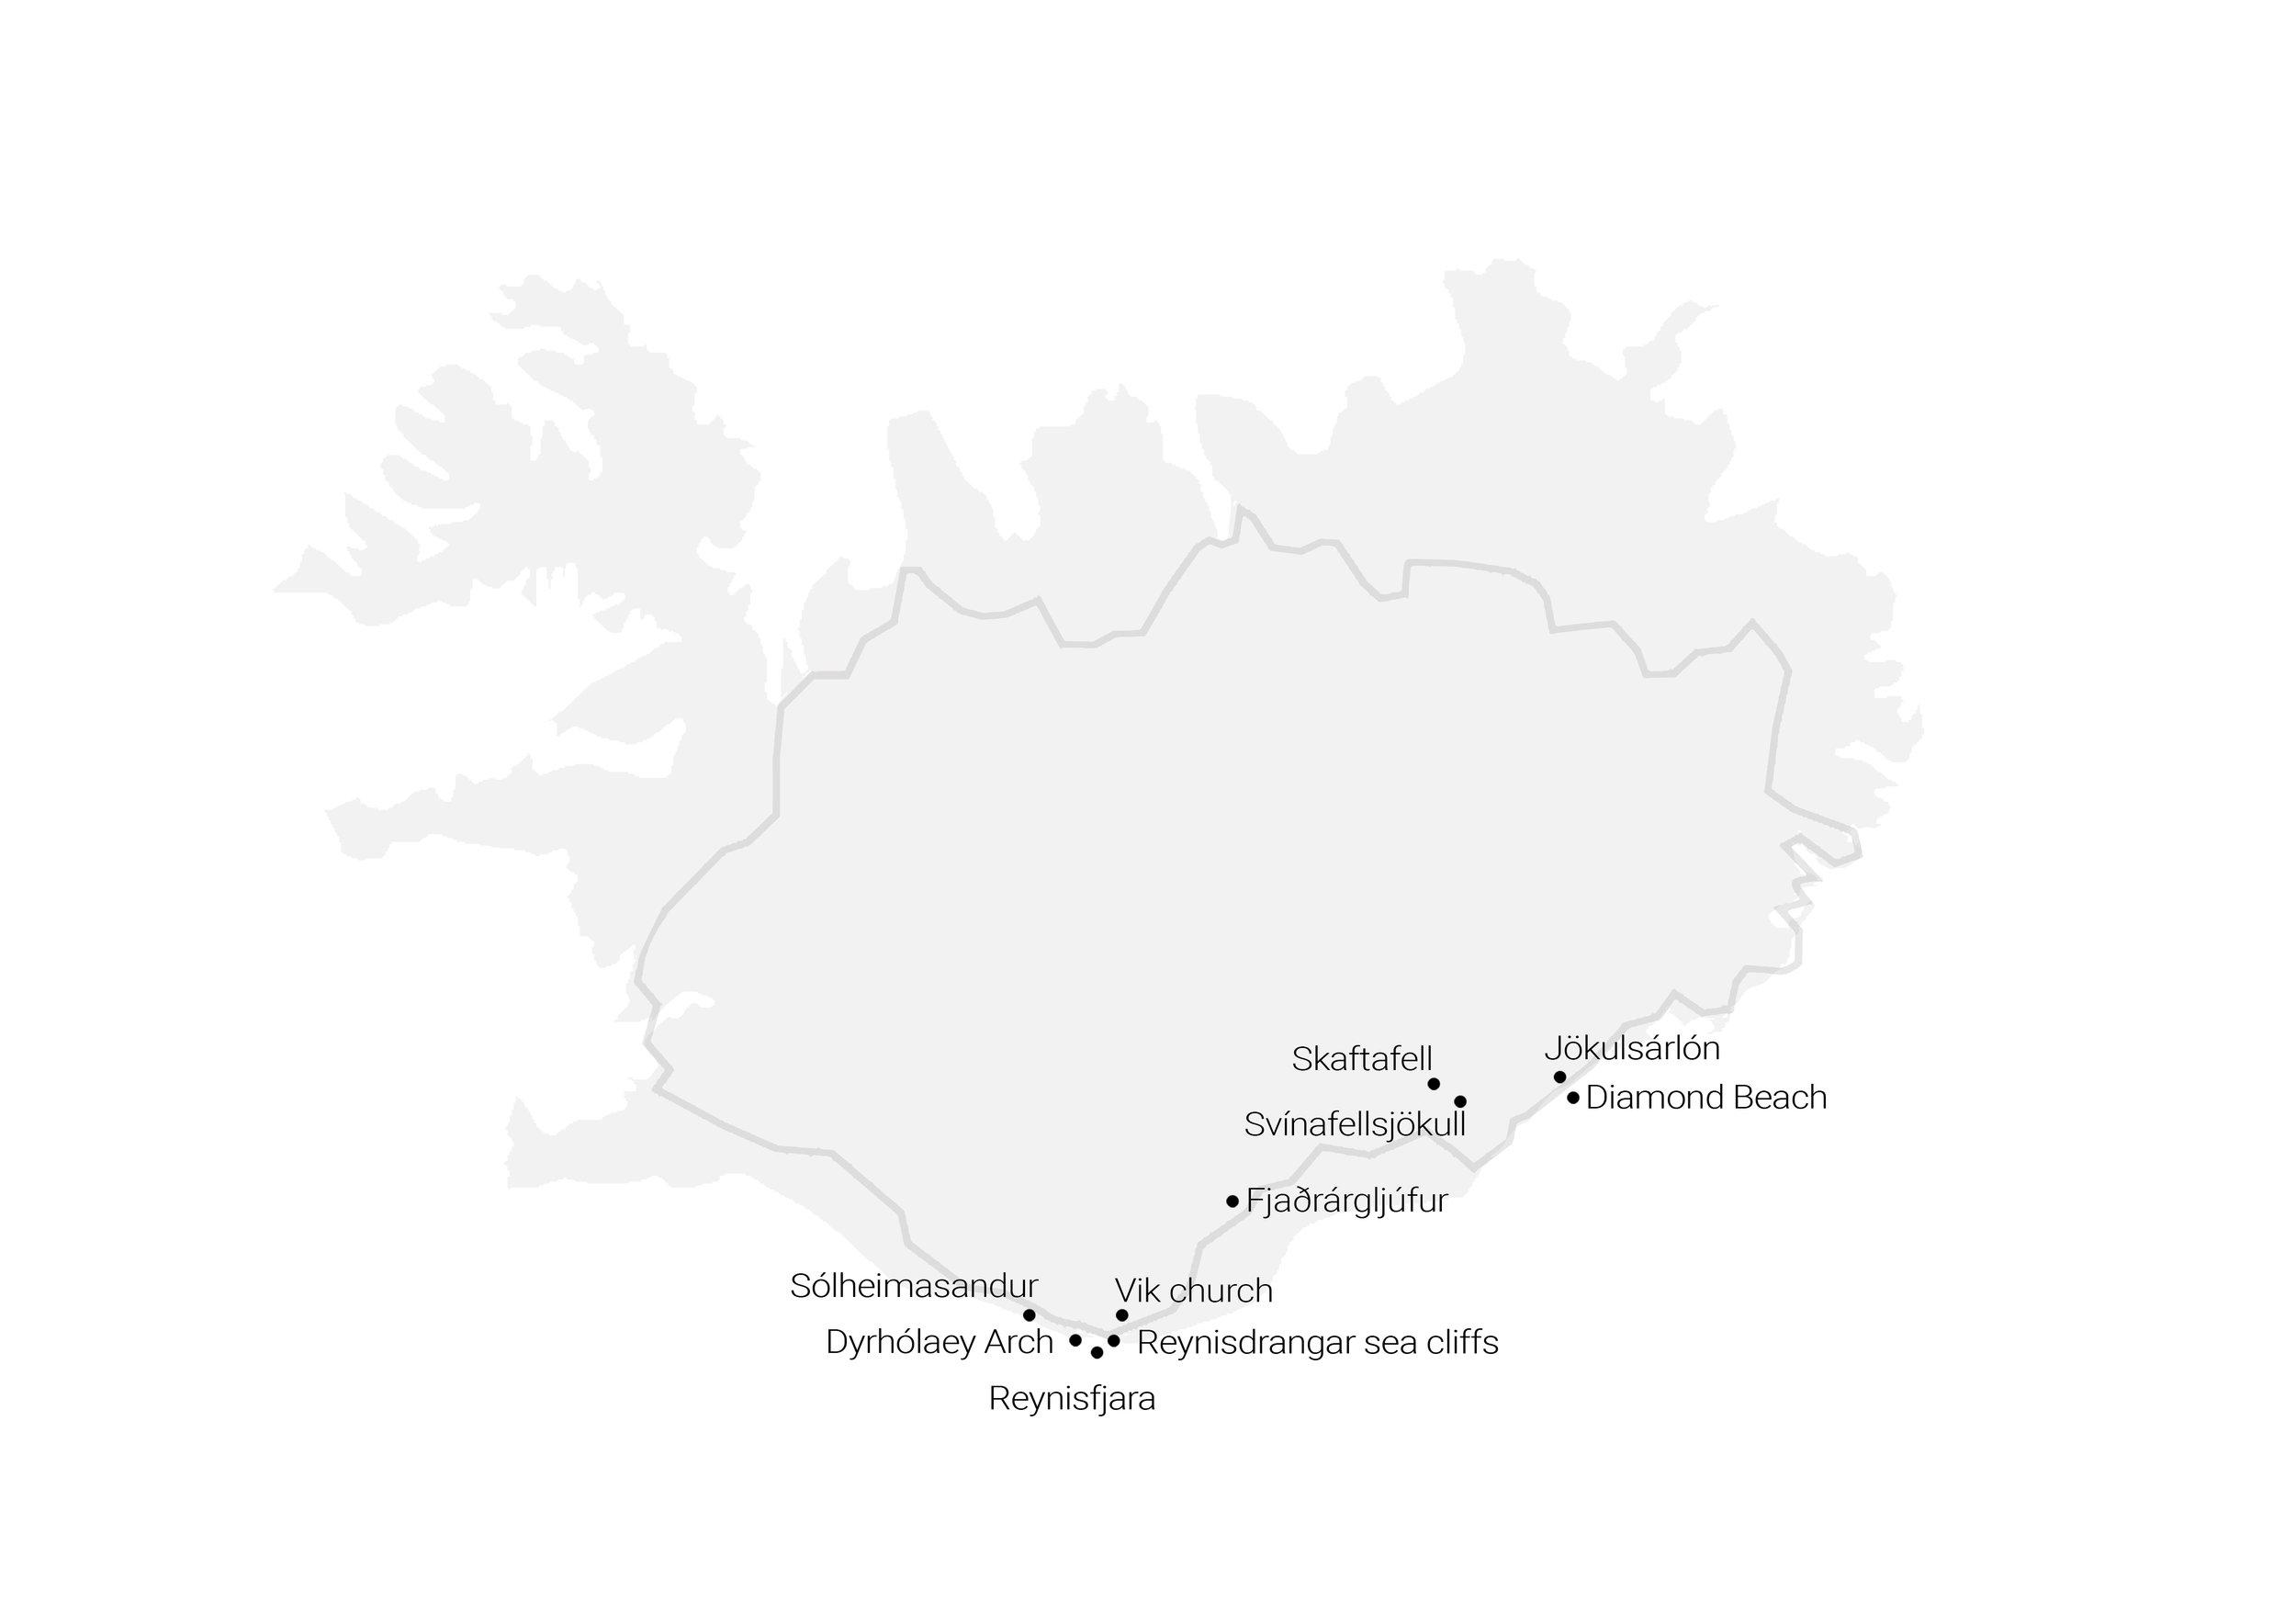 iceland_map_south iceland.jpg